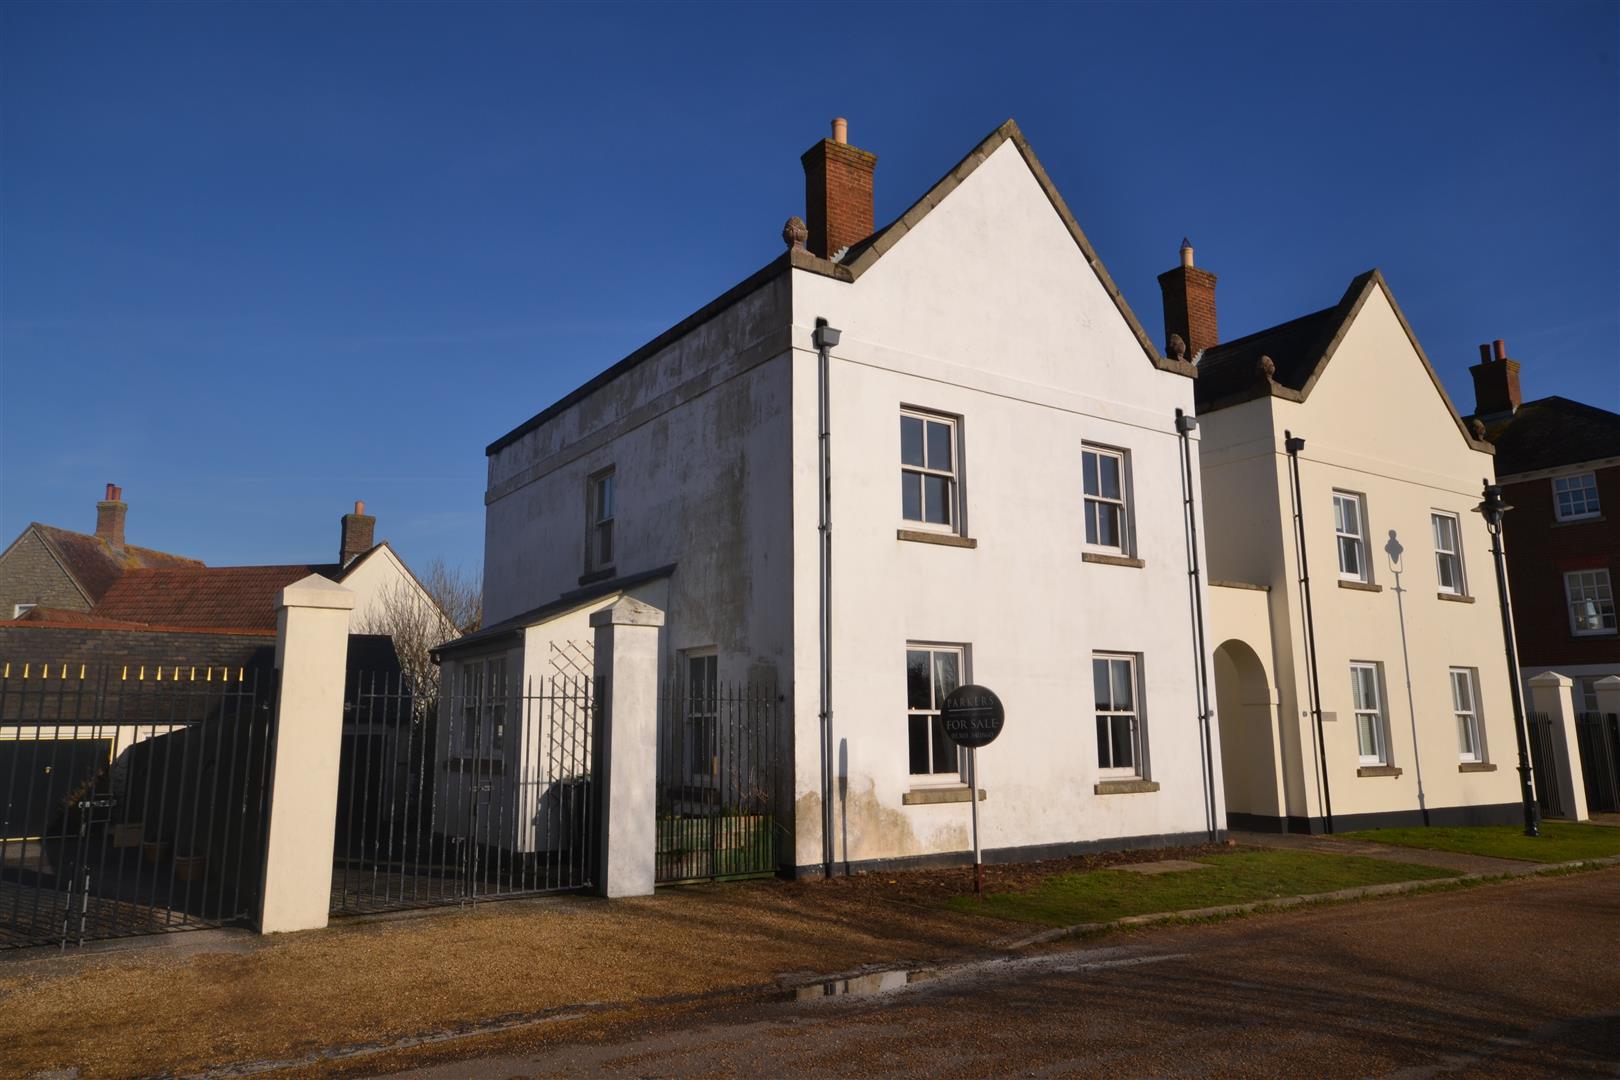 Holmead Walk, Poundbury, Dorchester